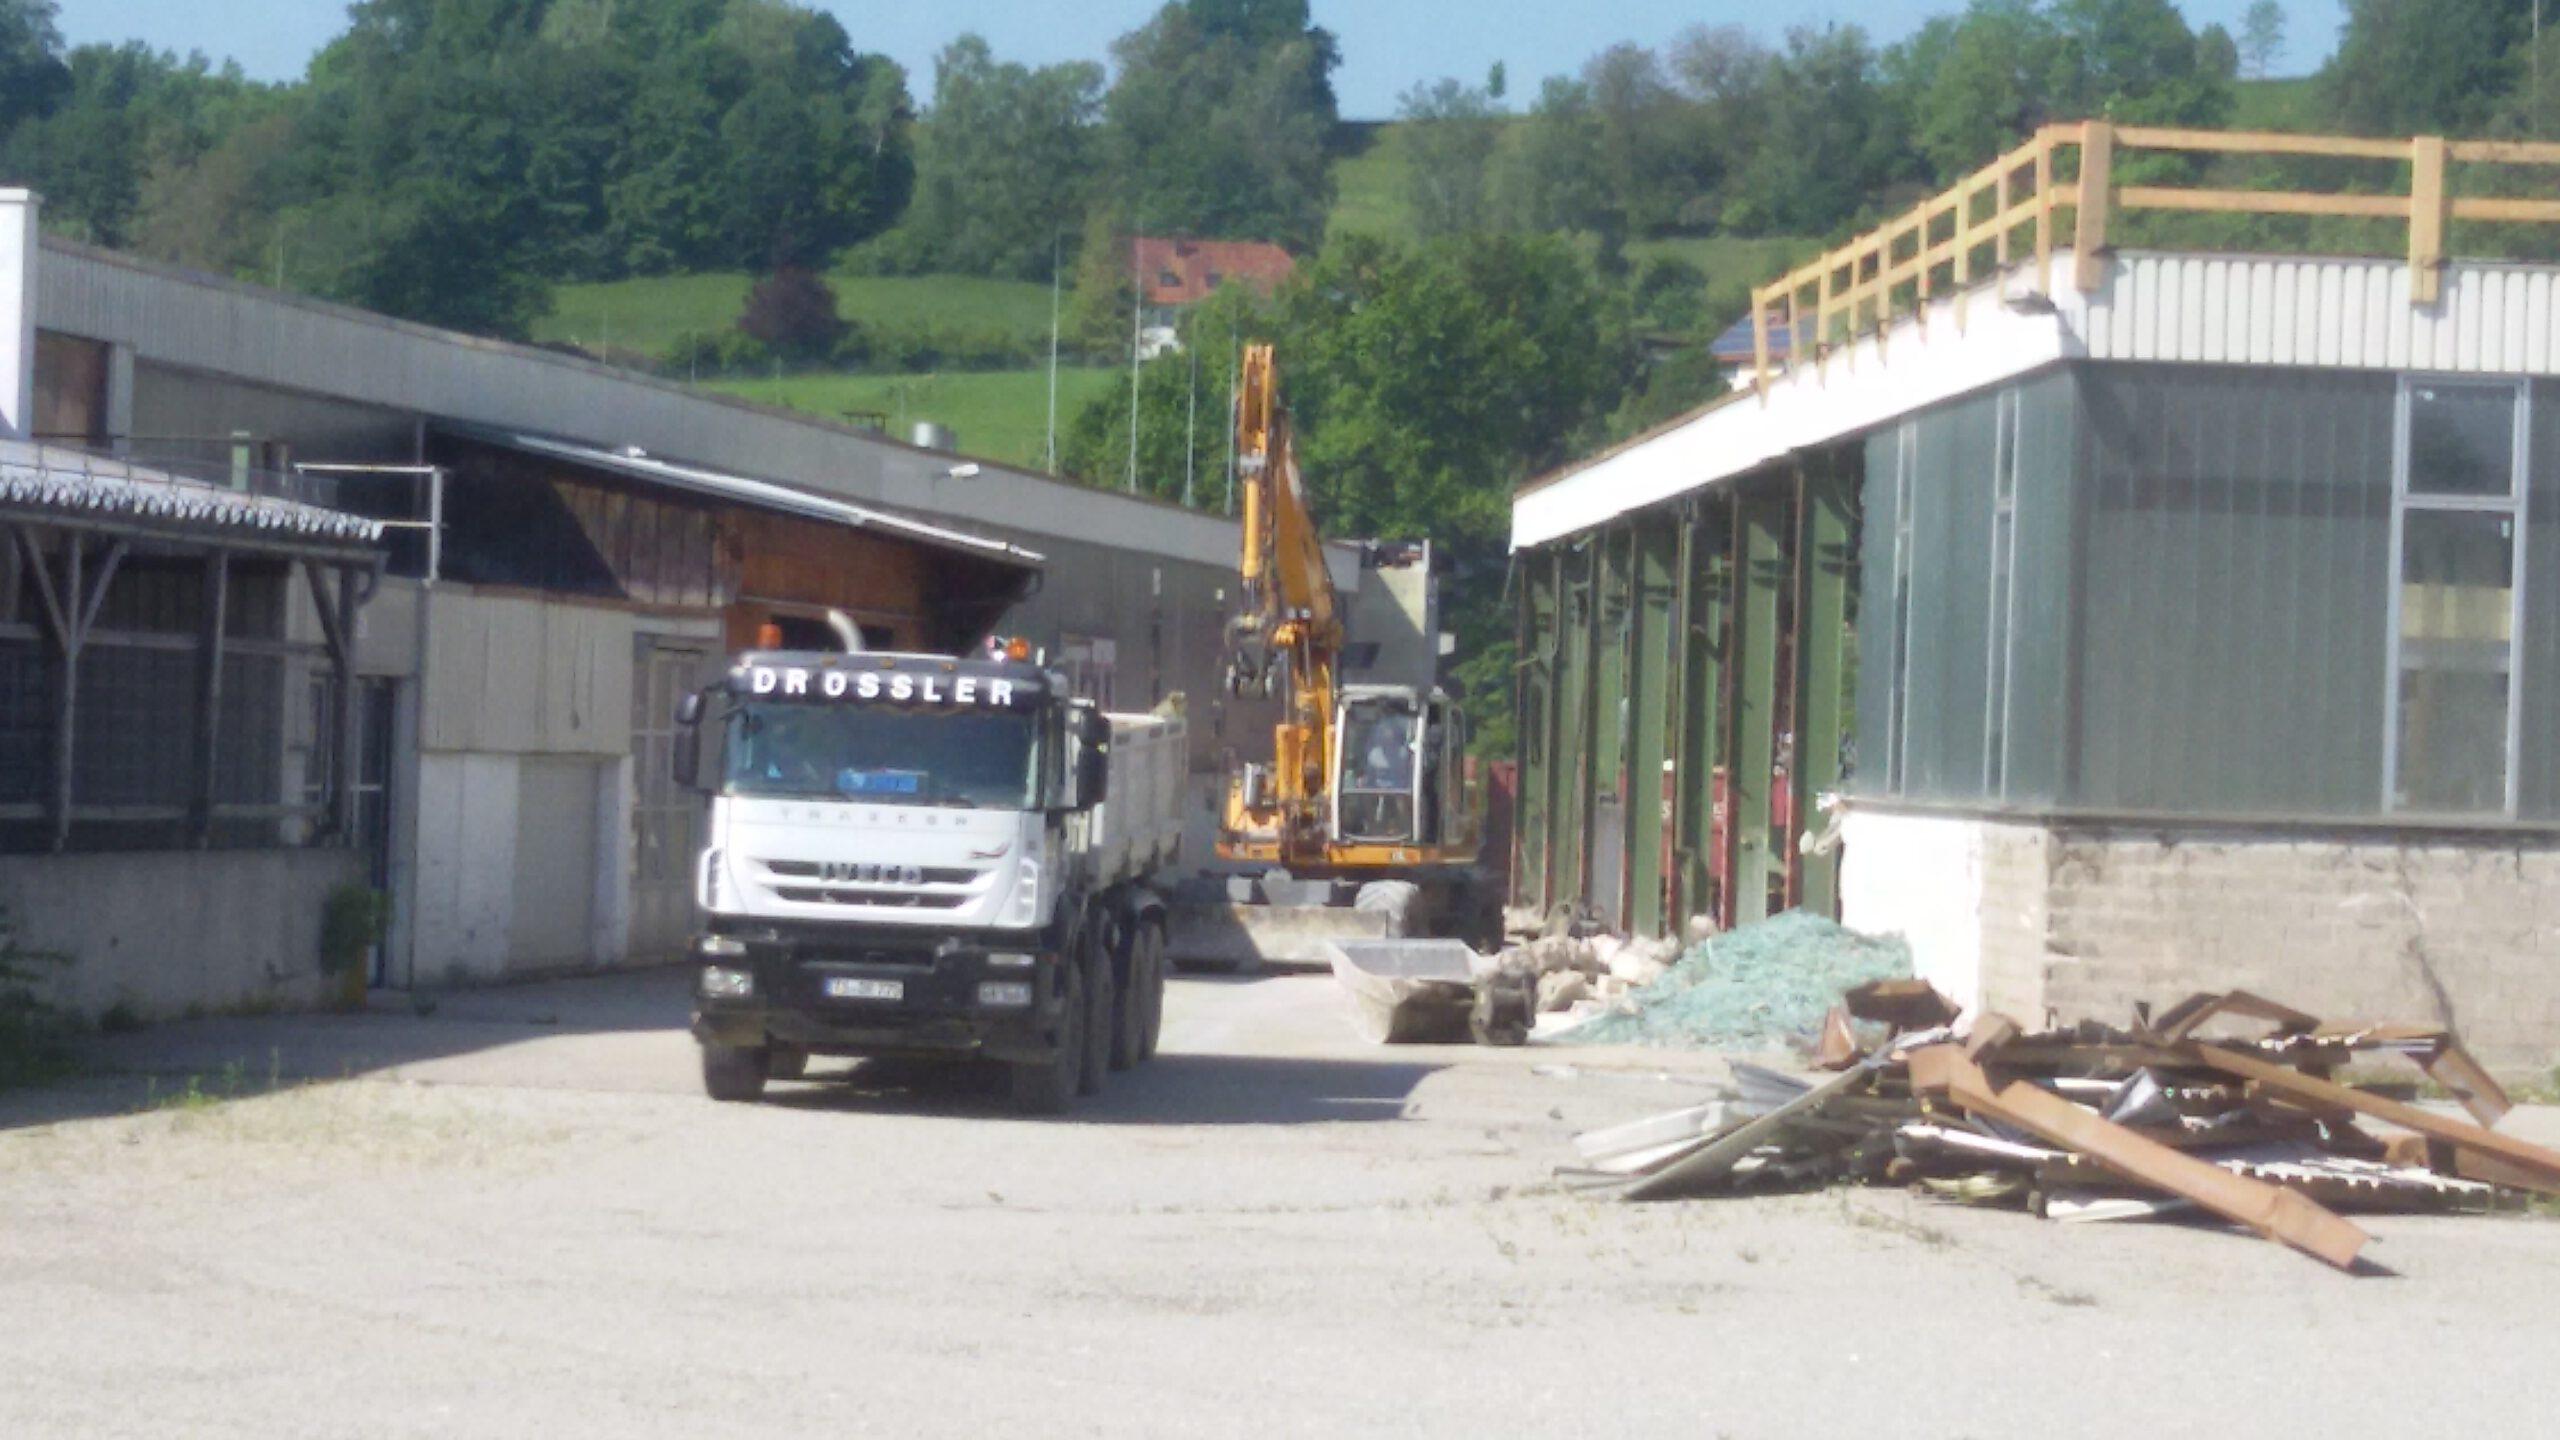 Fahrzeuge der Firma Drössler bei den Abbrucharbeiten